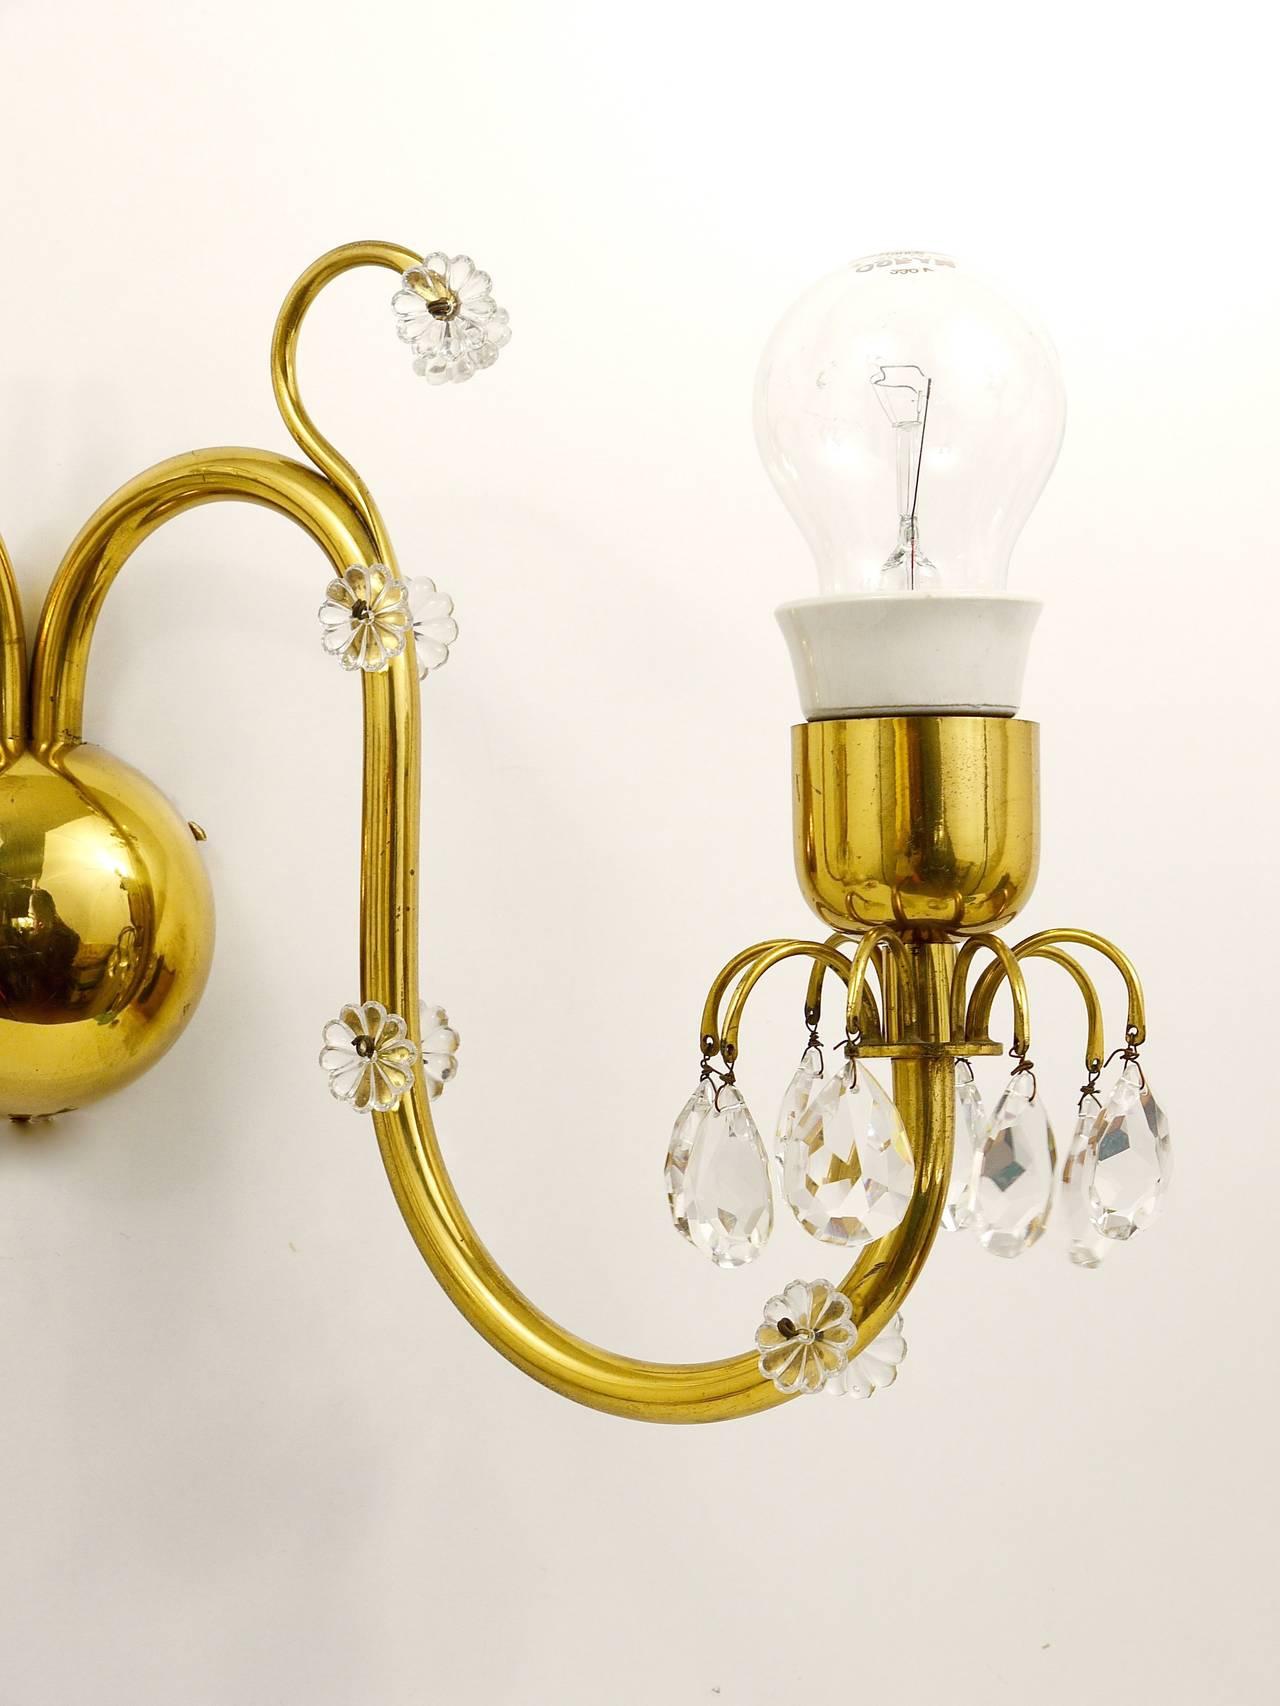 Mid-Century Modern Beautiful Huge Lobmeyr Vienna Brass Crystal Sconce Wall Light, Austria, 1950s For Sale